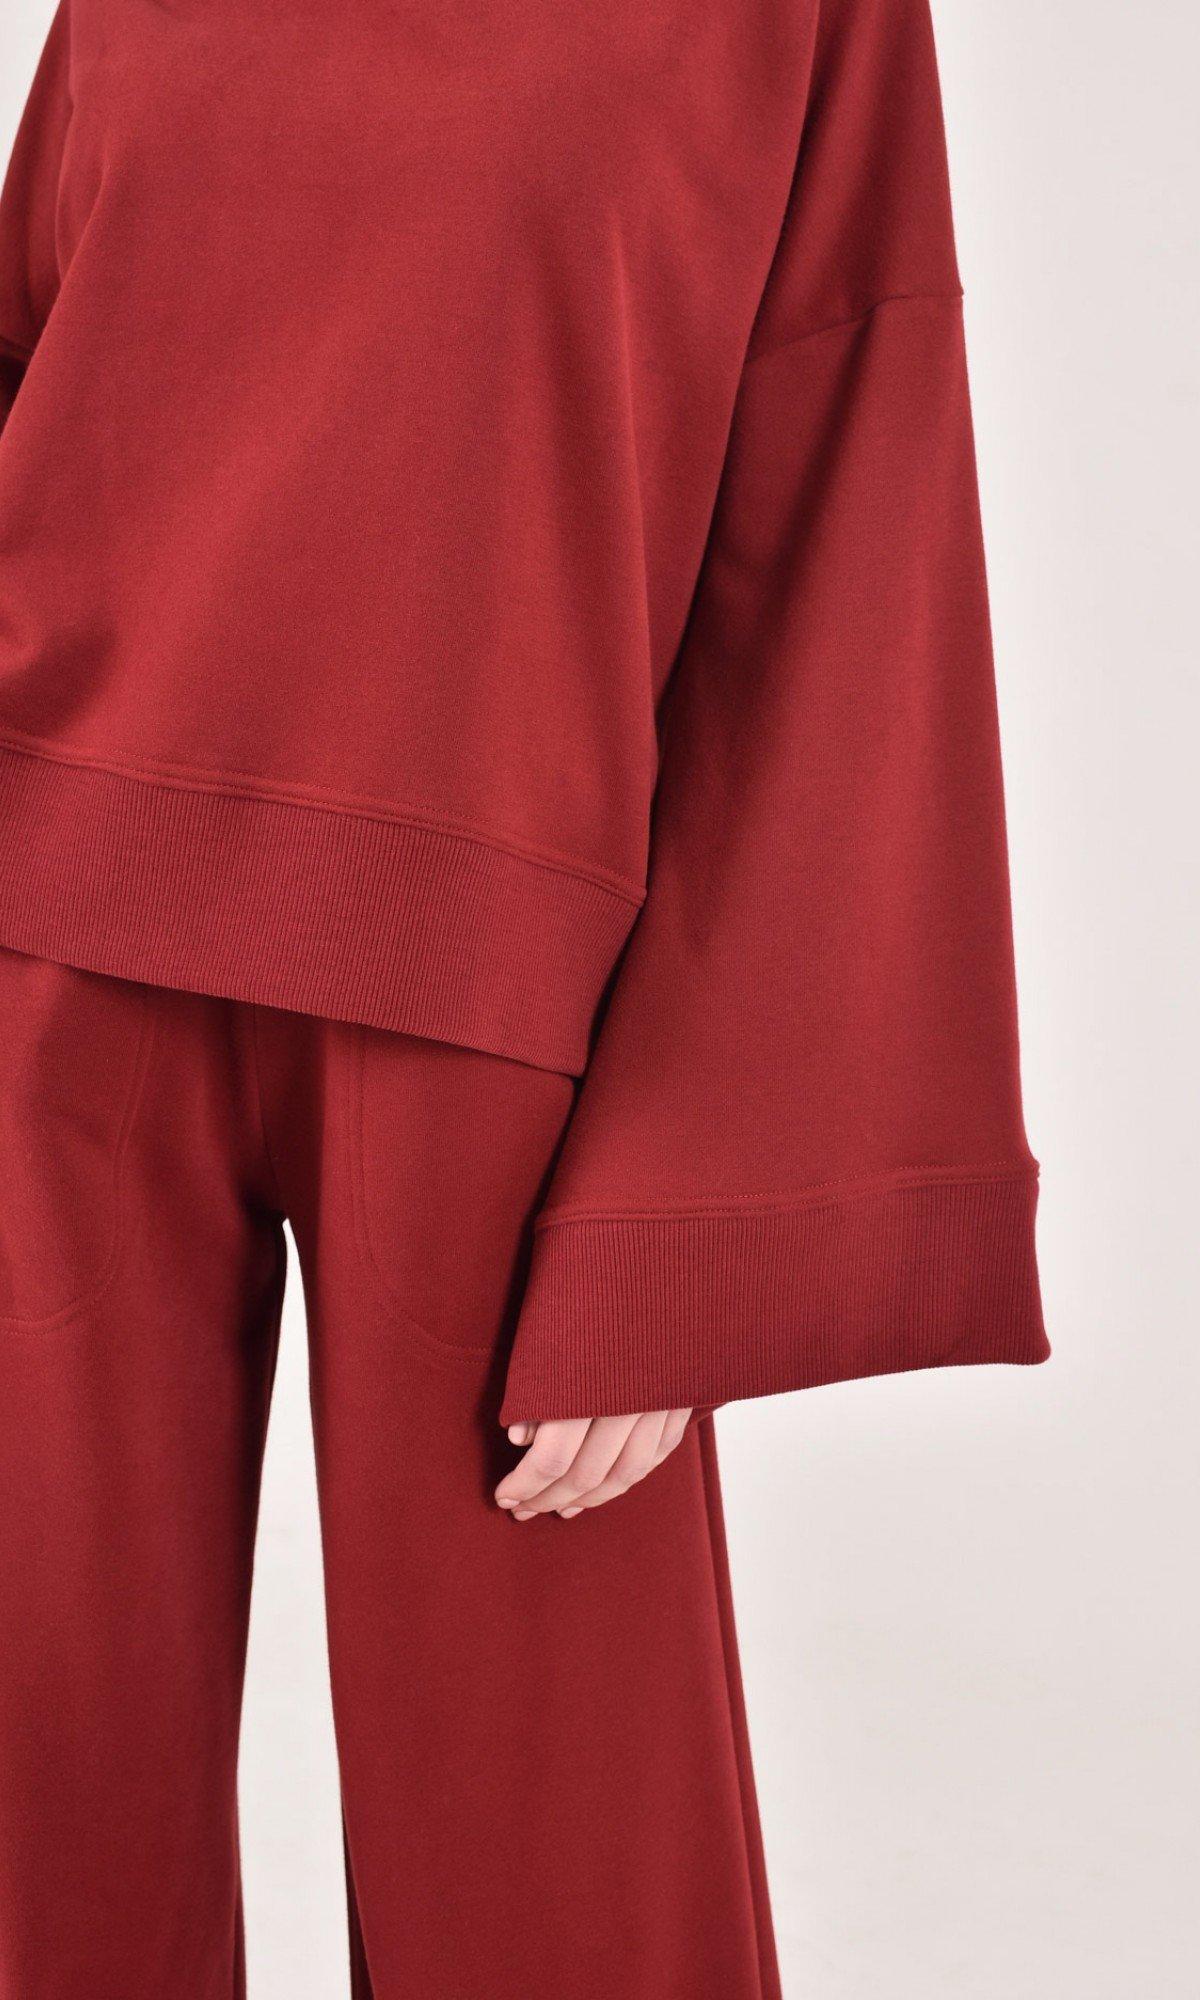 Elegant high waist pants A90443